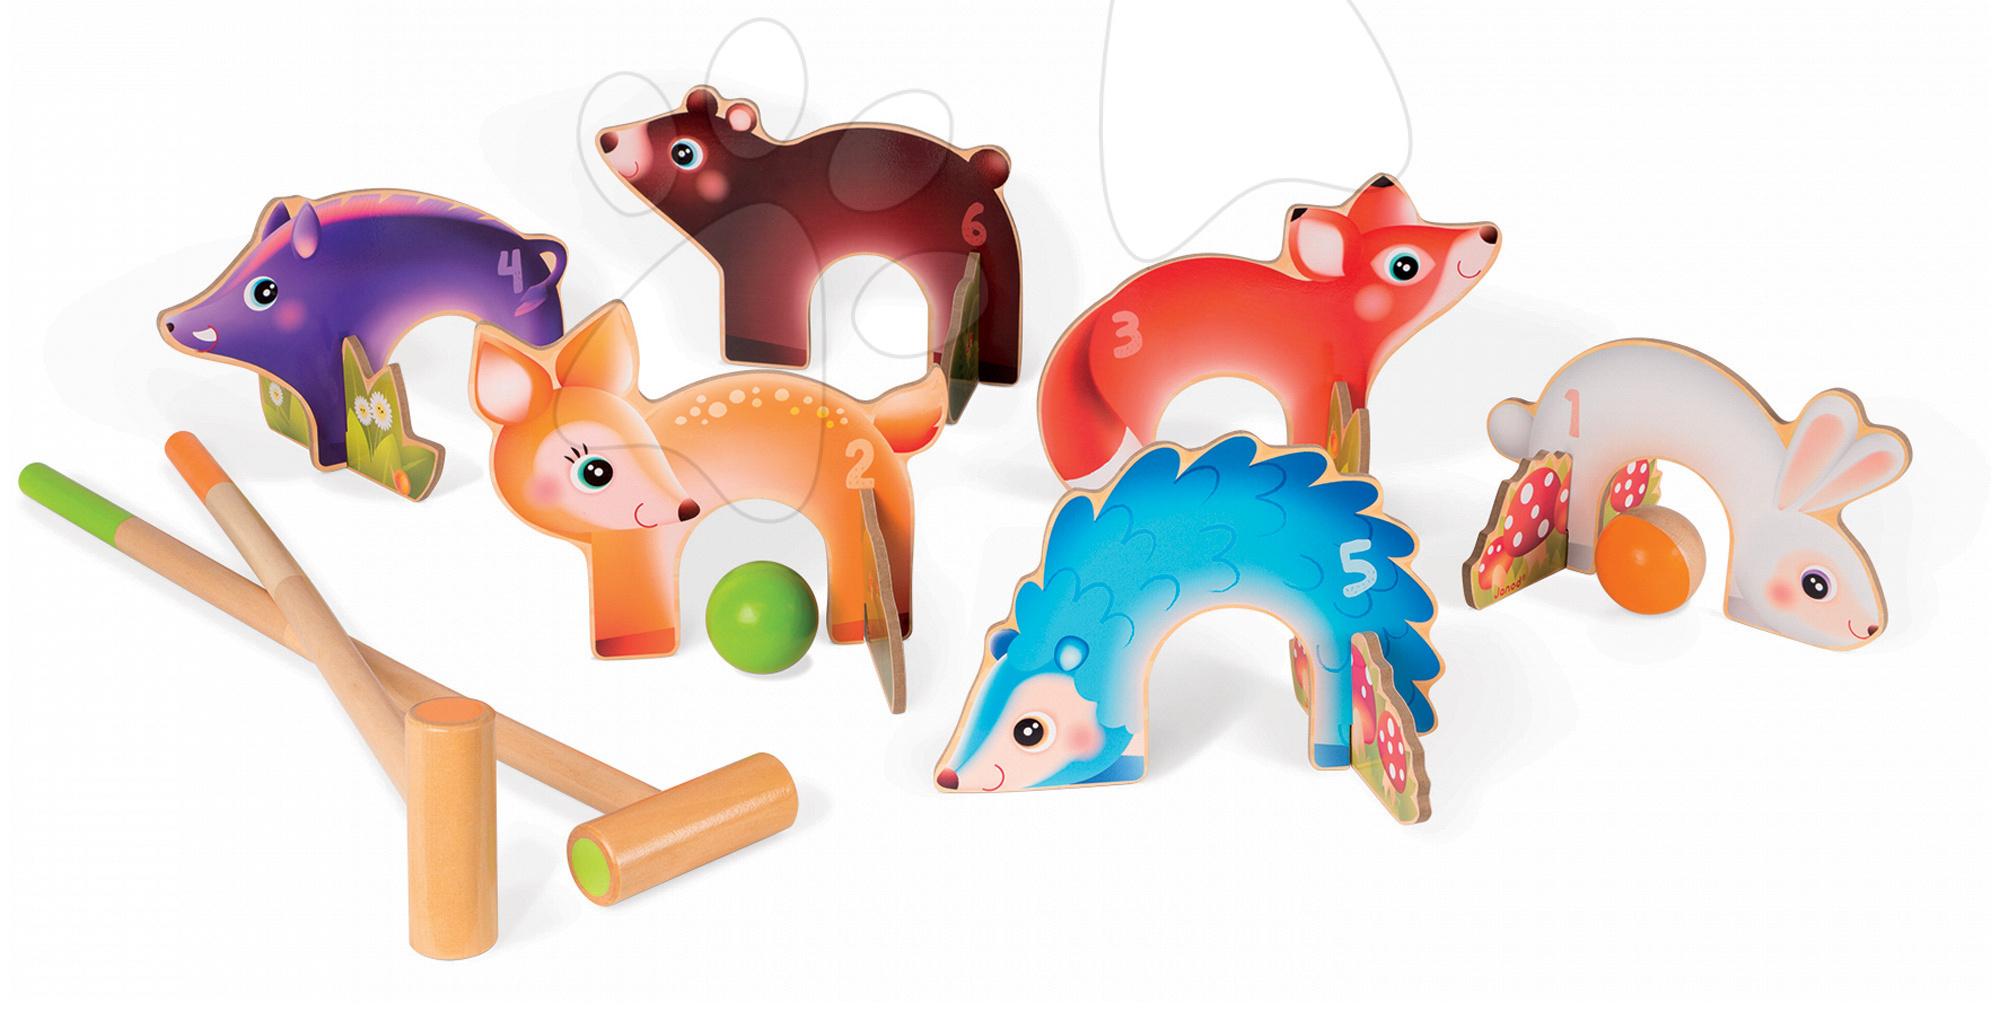 Kroket - Drevený kroket Forest Animal Croquet Janod so 6 lesnými zvieratkami